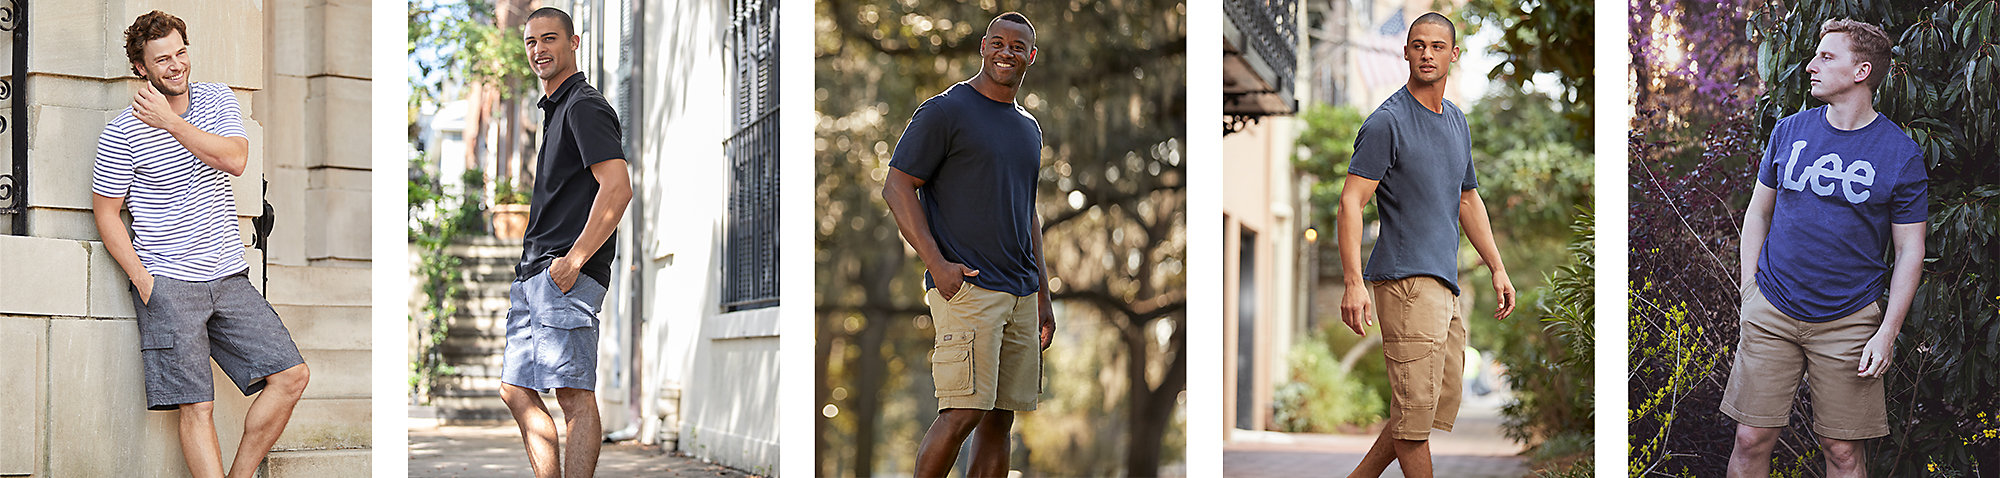 When to Wear Men's Shorts